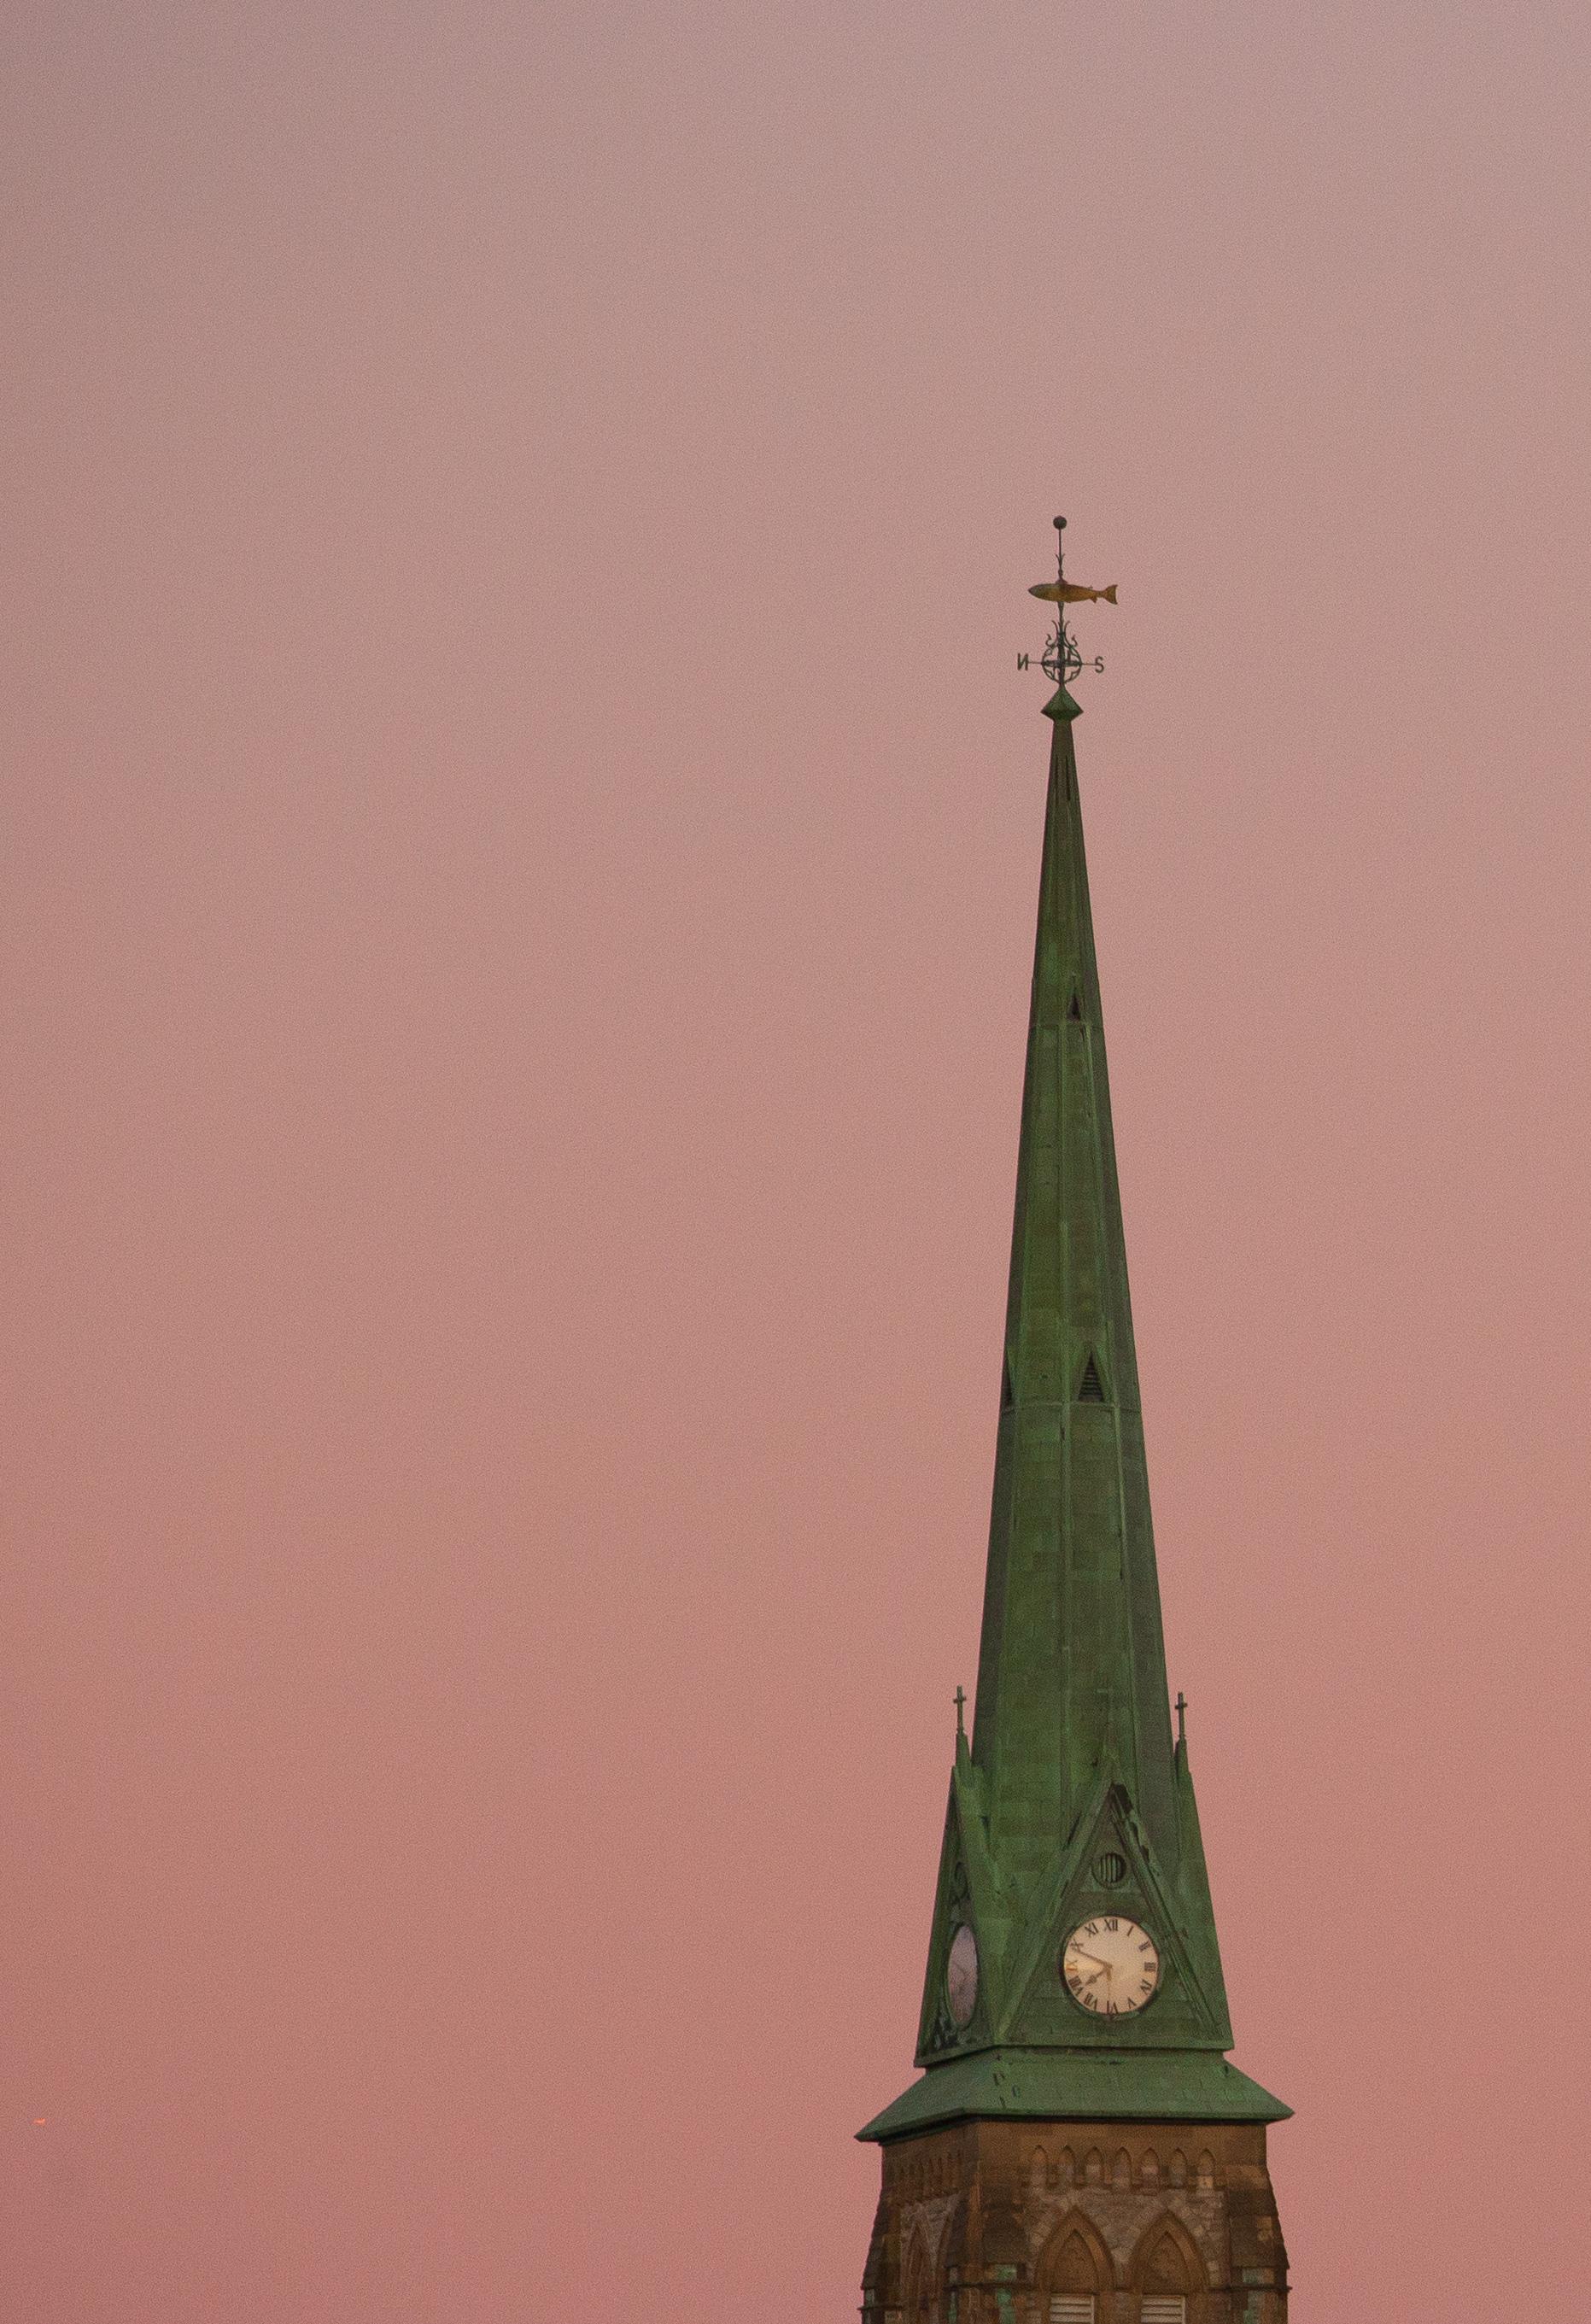 A photograph depicting Church Steeple Saint John